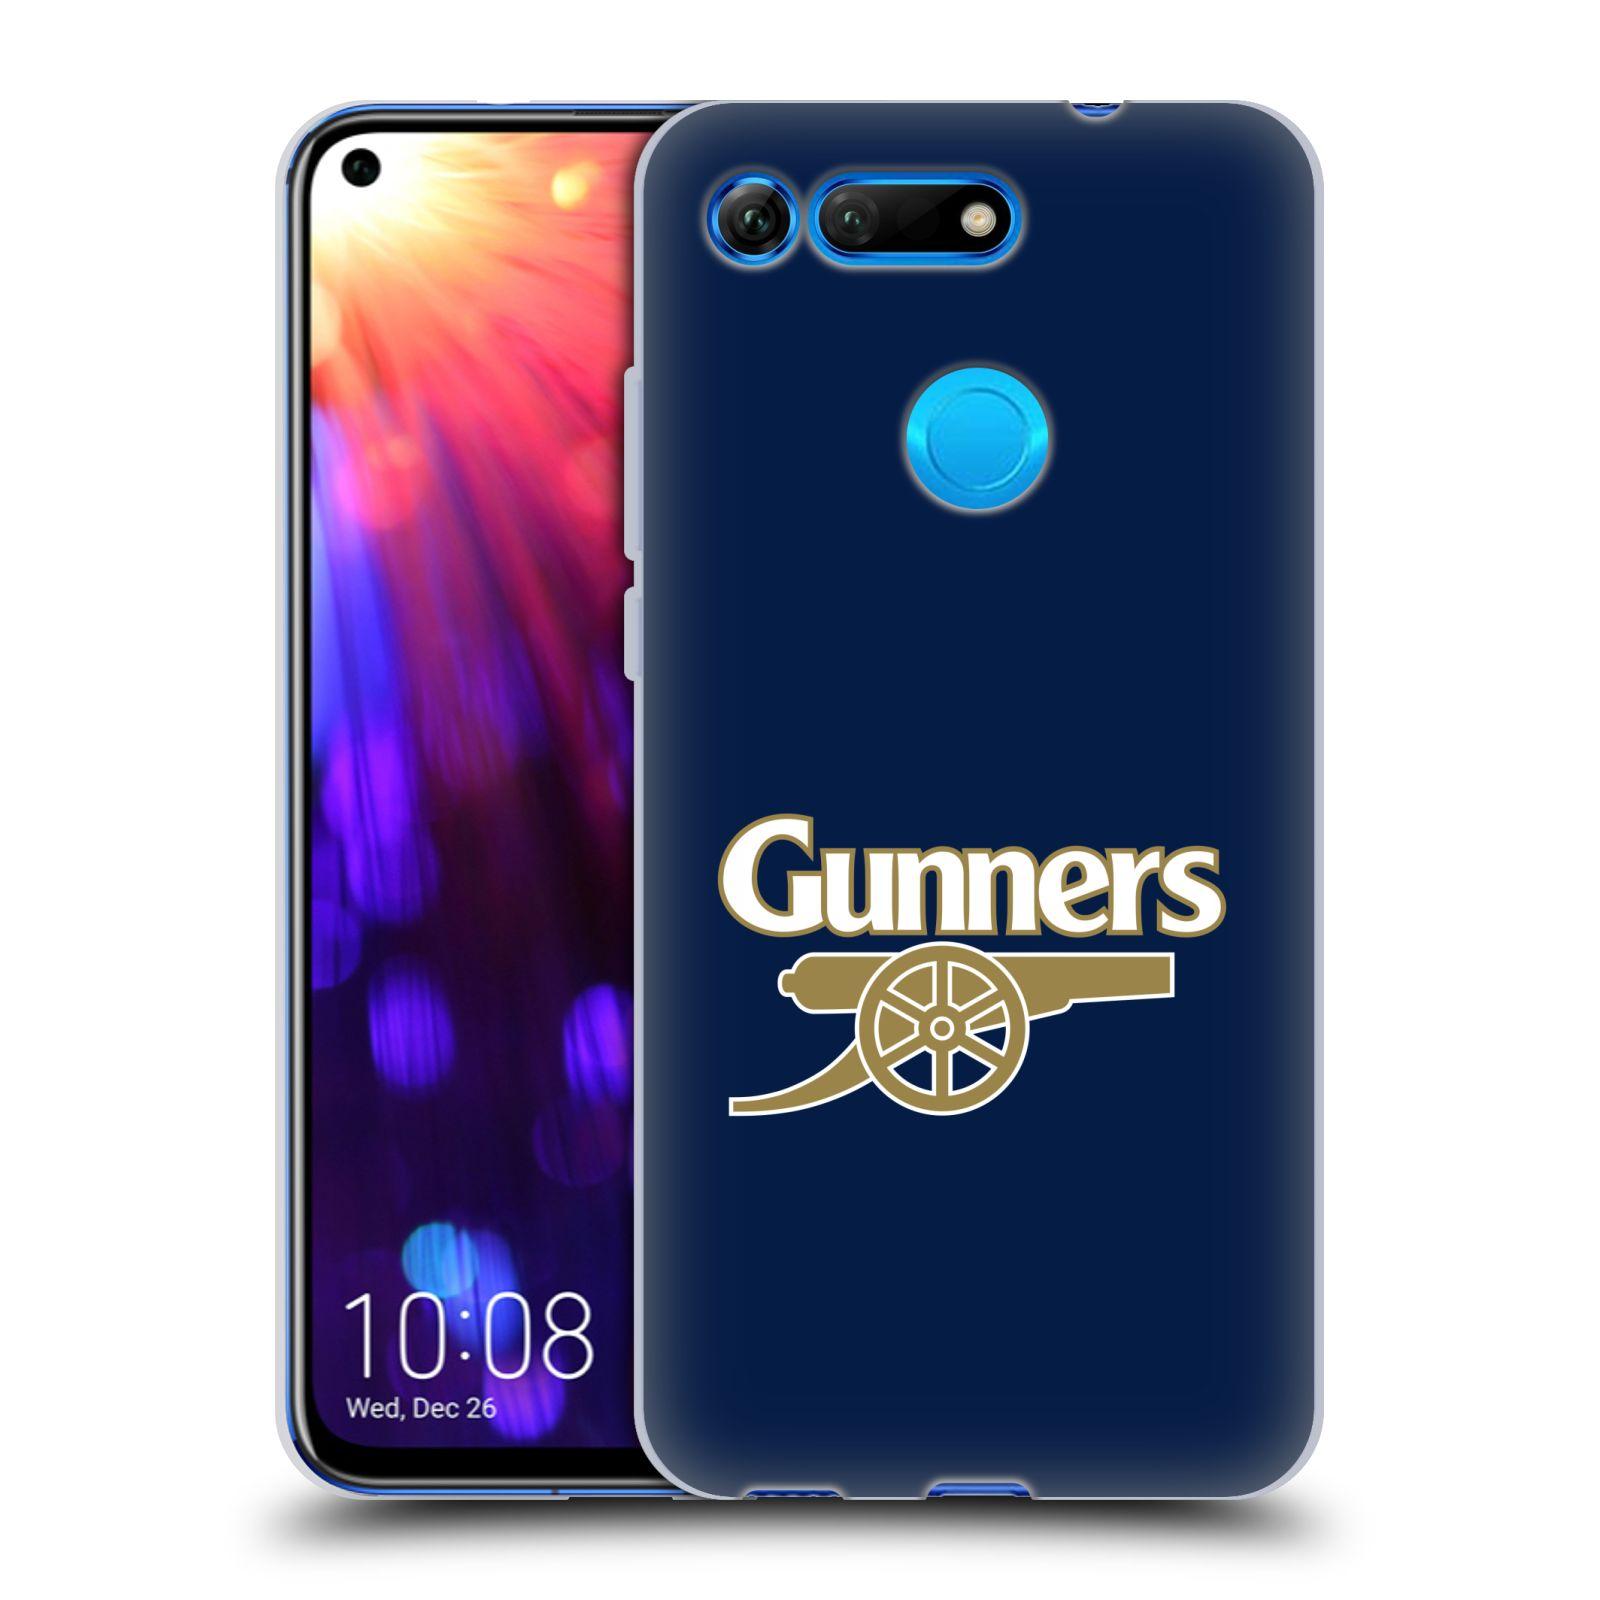 Silikonové pouzdro na mobil Honor View 20 - Head Case - Arsenal FC - Gunners